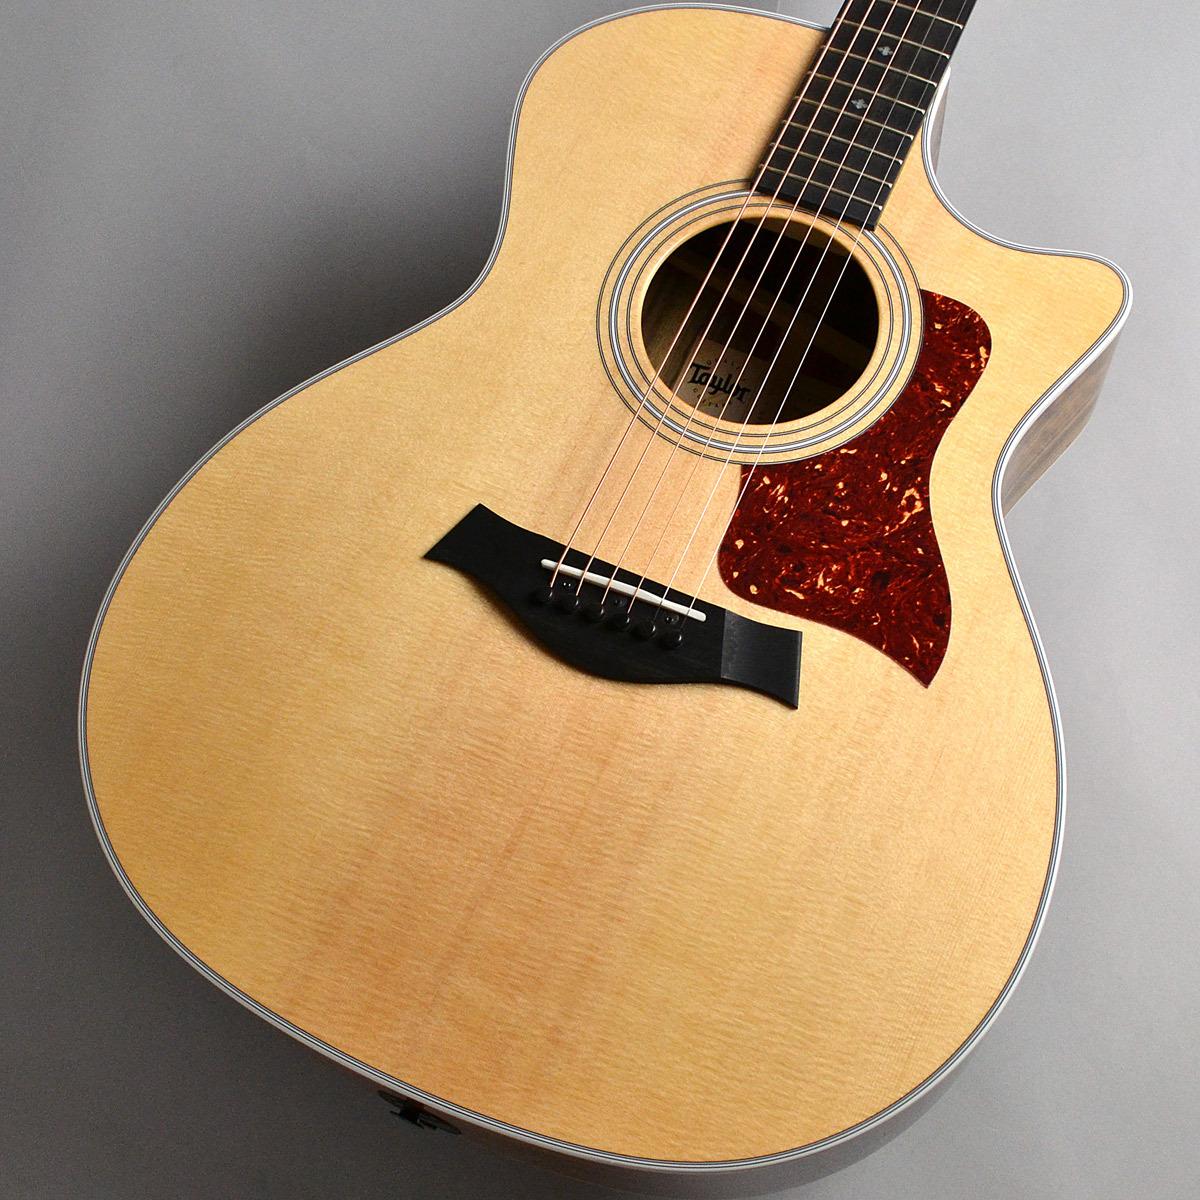 Taylor 414ce V-Class エレアコギター 【テイラー 414ce】【新宿PePe店】